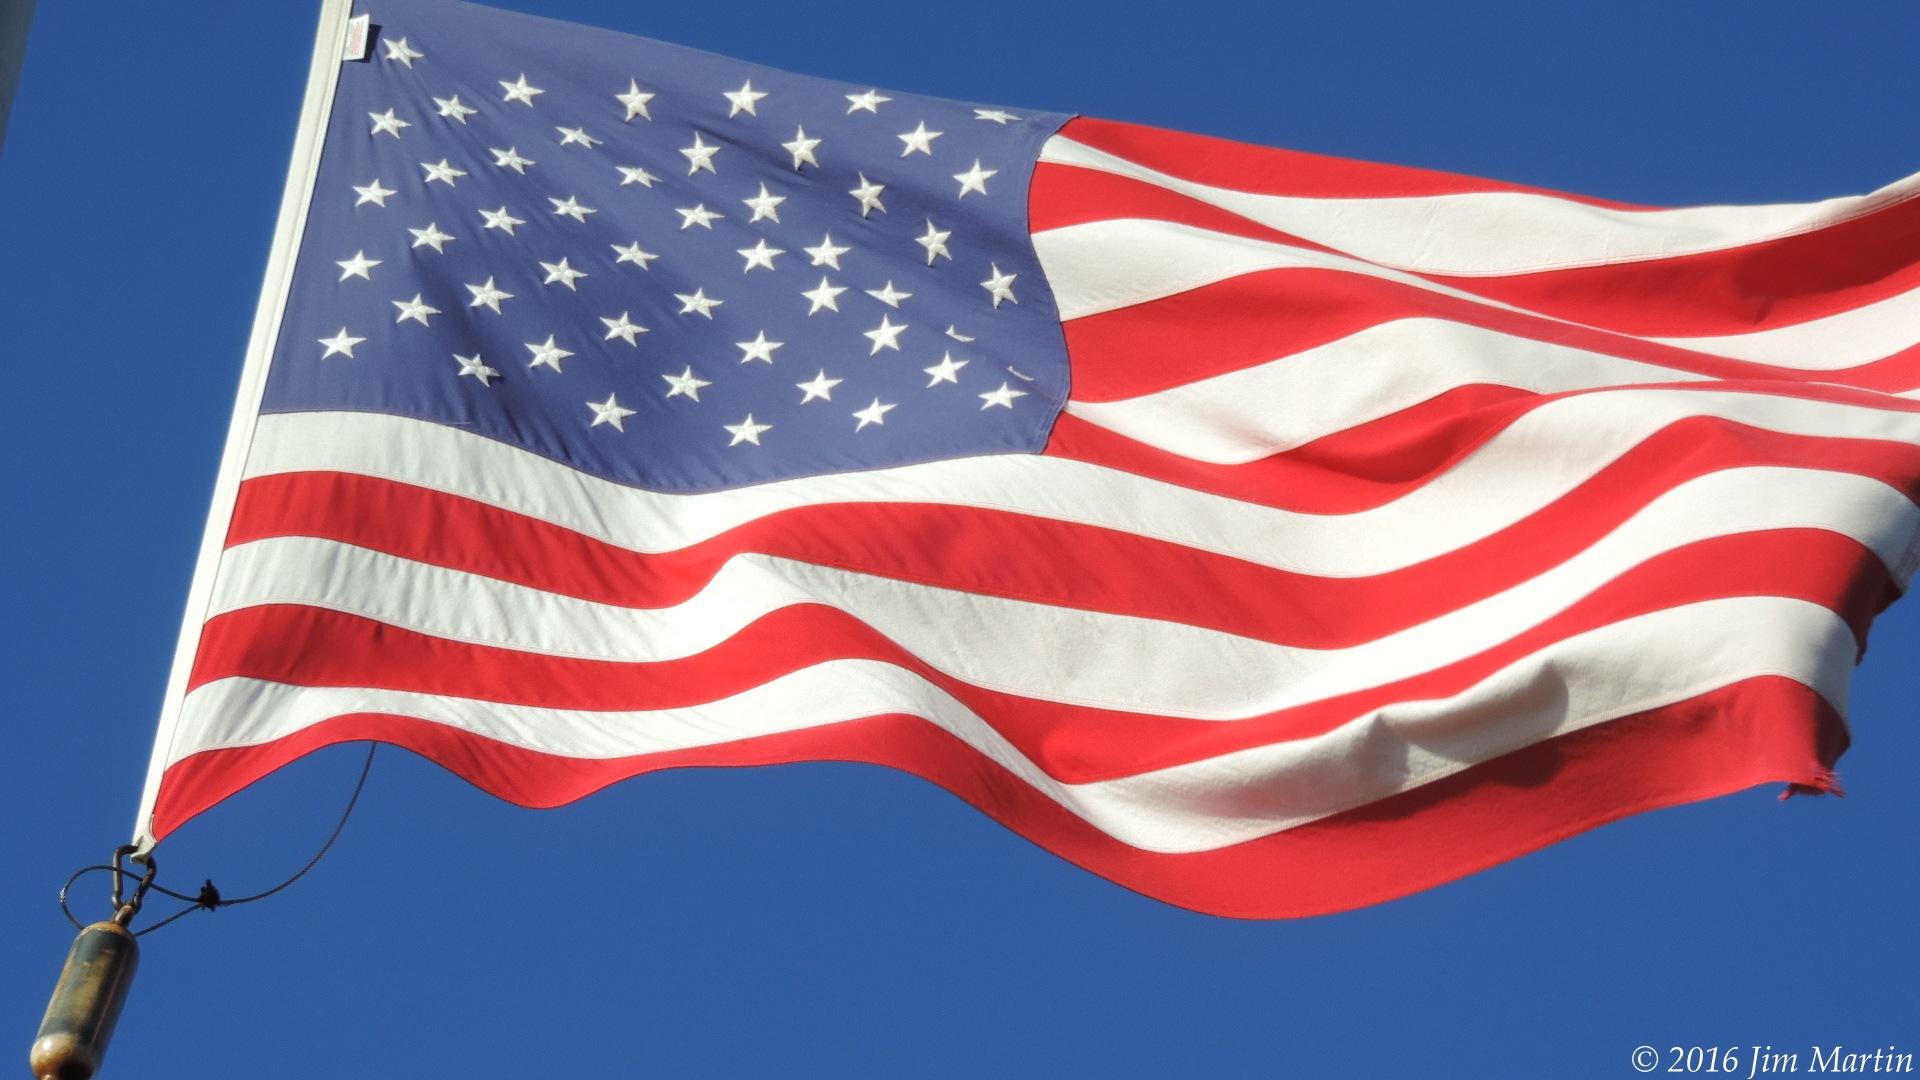 USA Flag by Jim Martin